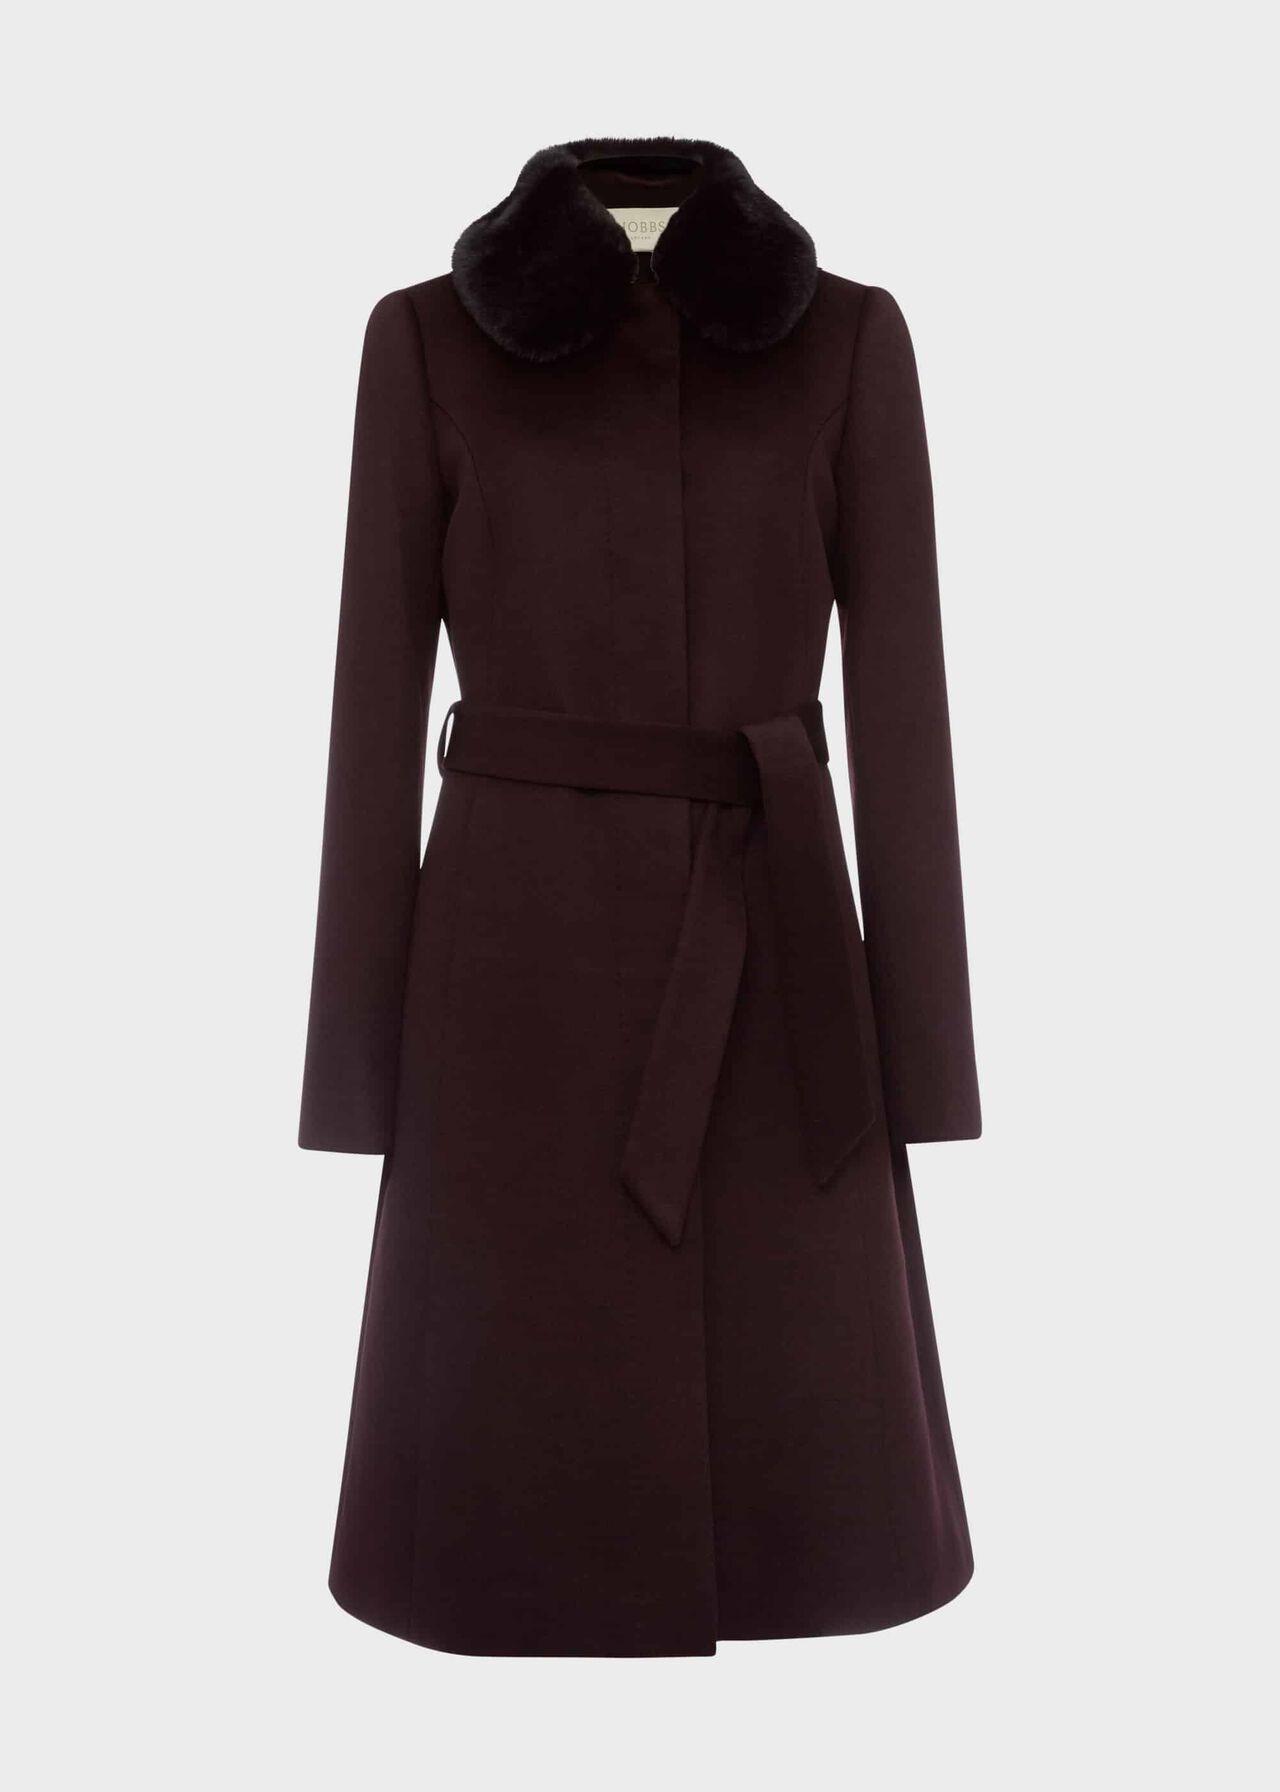 Edeline Wool Coat With Faux Fur Collar Wine